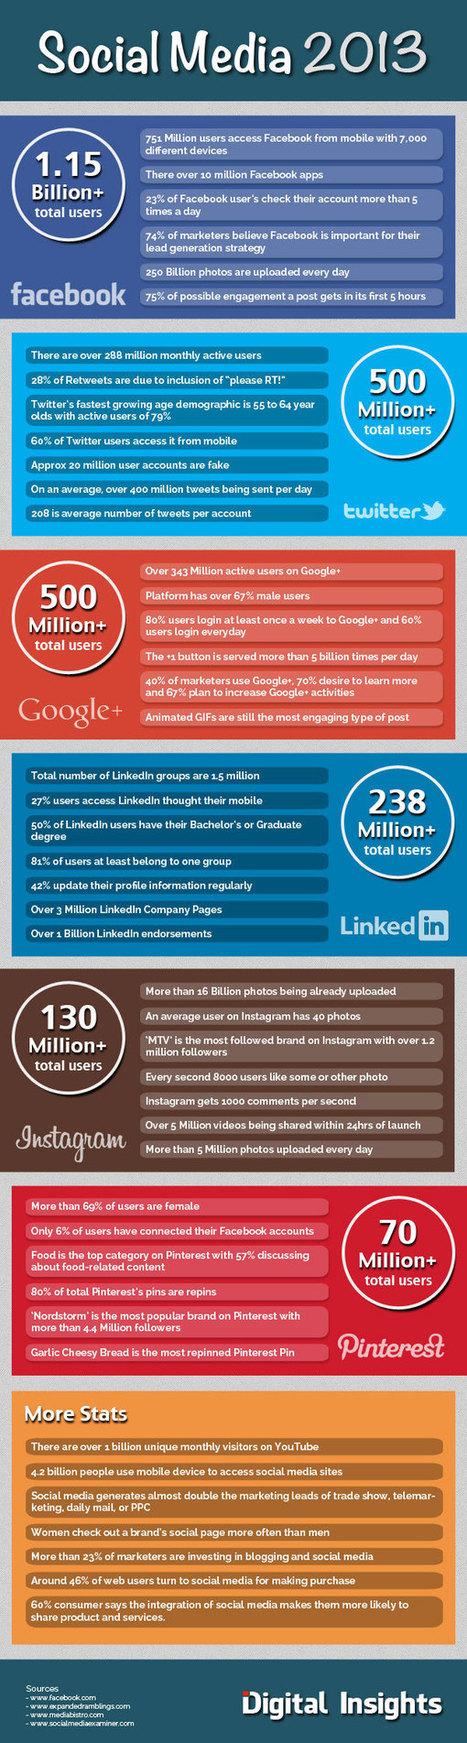 Infographic - Social Media Facts of 2013   e-RH: Tecnologia Unindo Pessoas   Scoop.it